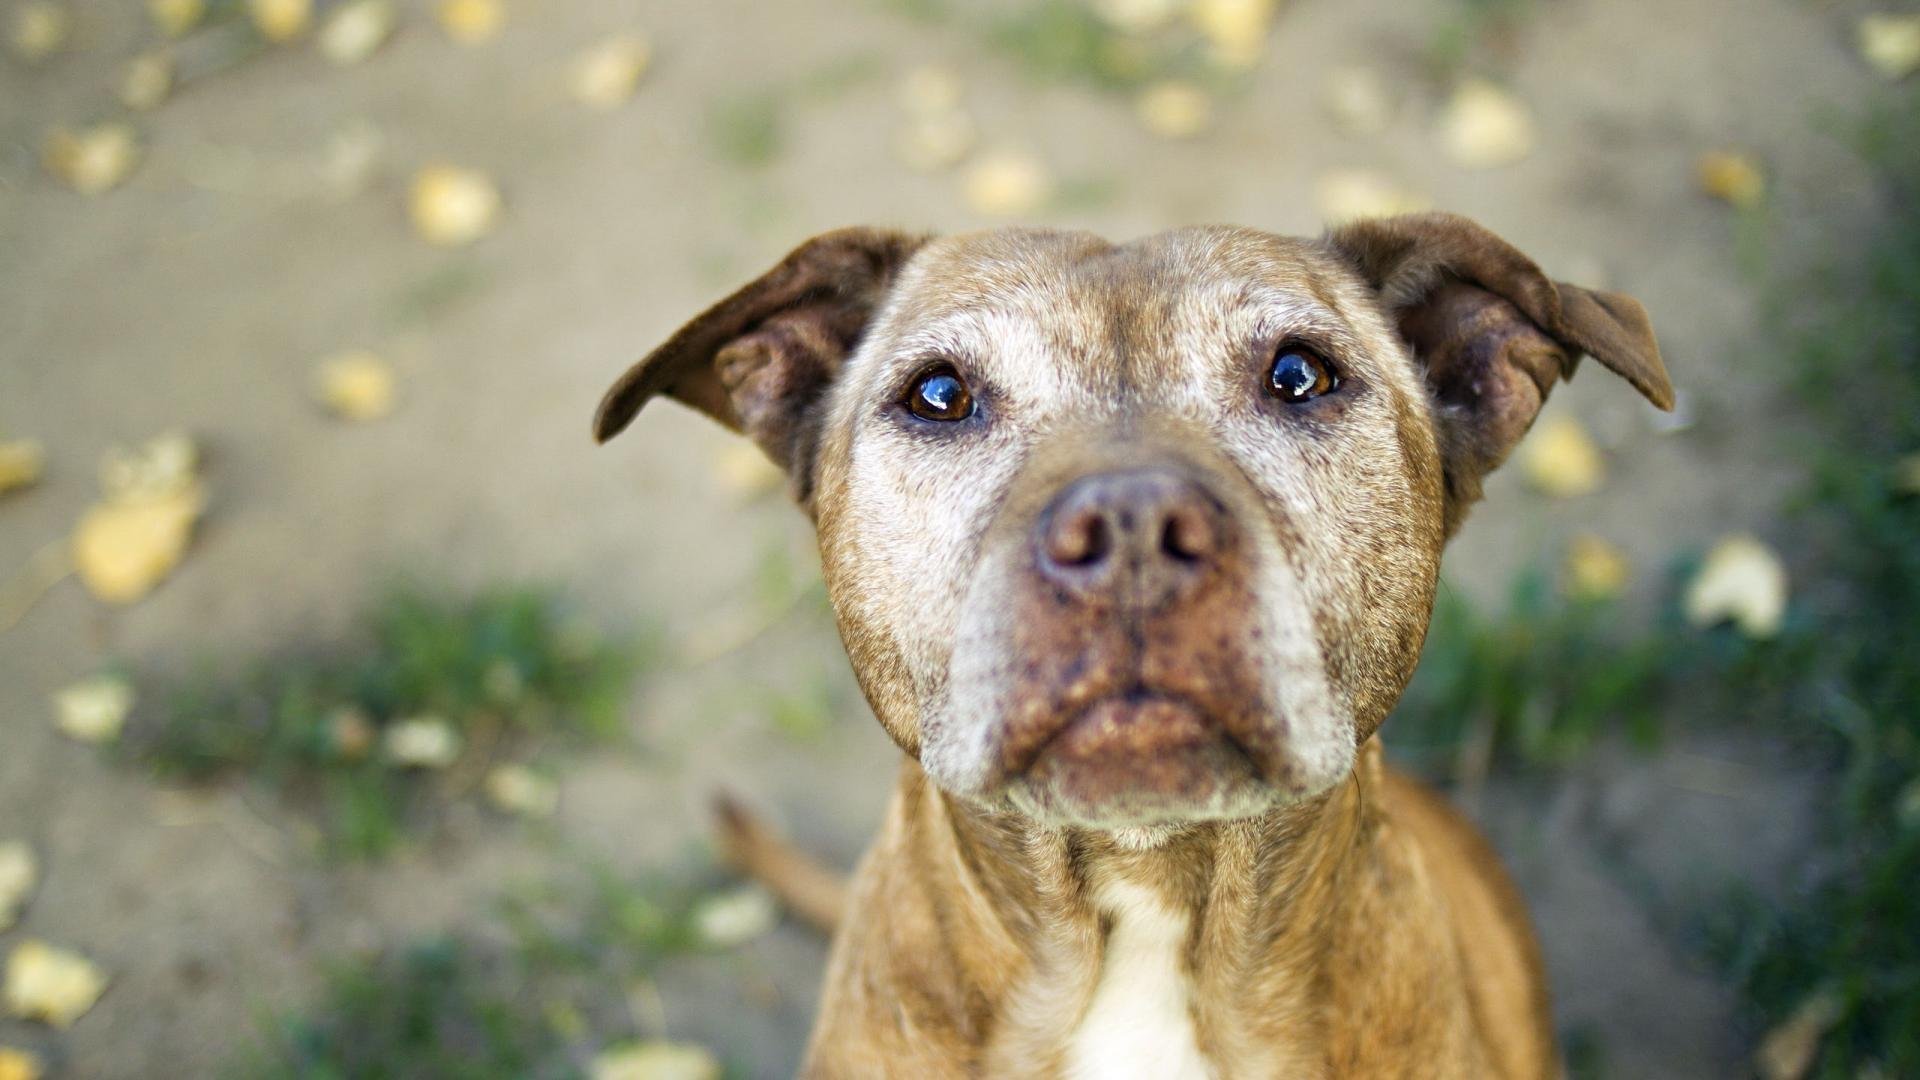 Cute Dog Pitbull Puppies HD Wallpaper Cute Dog Pitbull Puppies